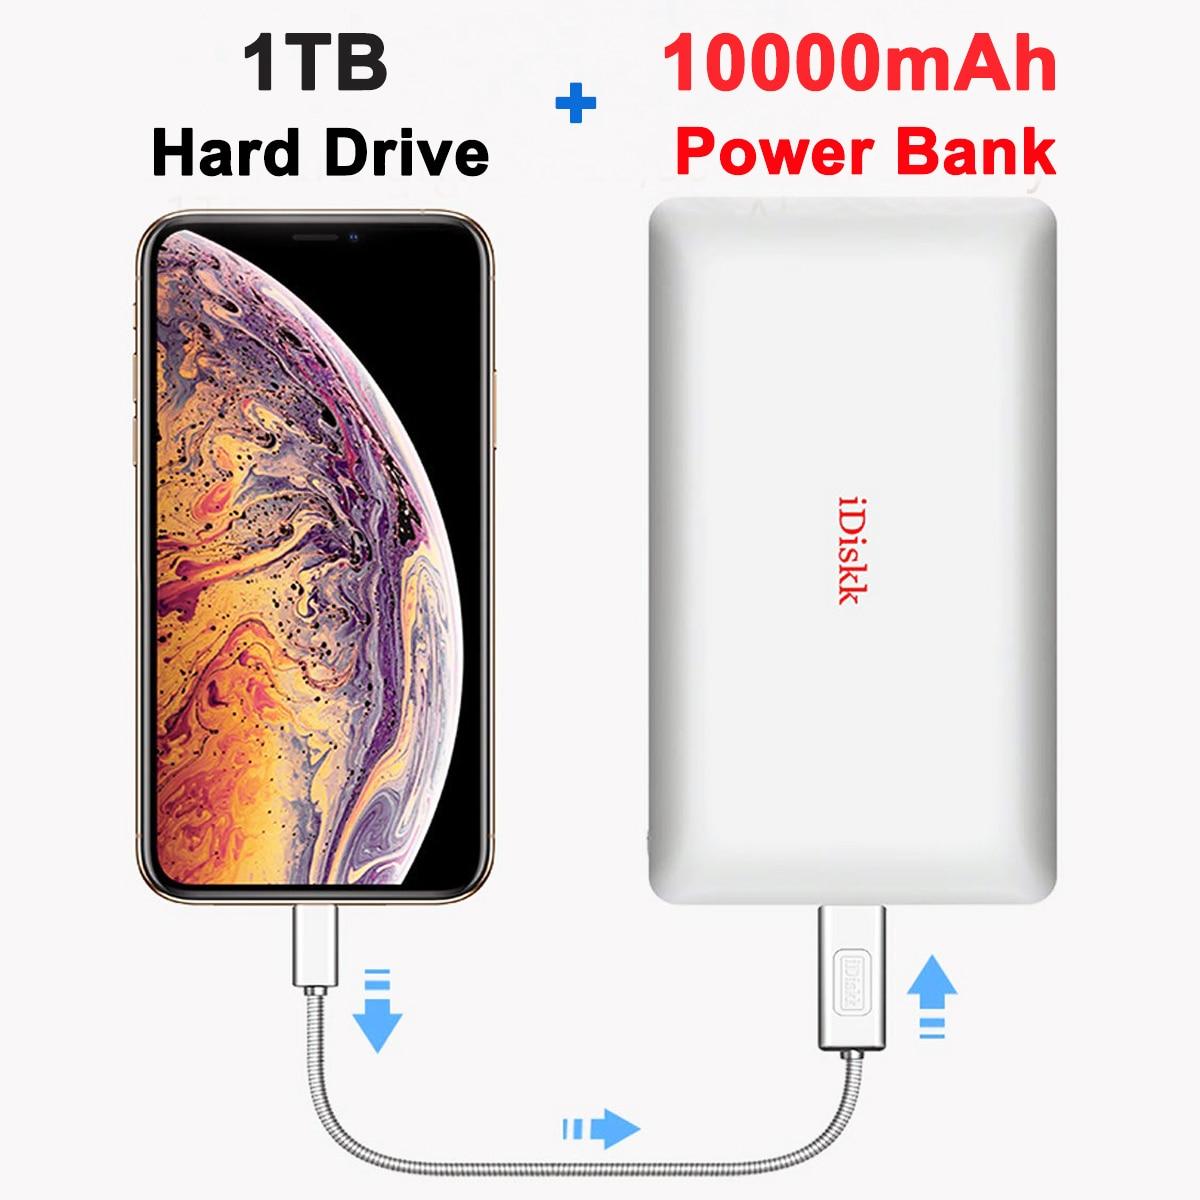 Promo MFi Certified iDiskk 1TB iPhone External Hard Drive Storage 10000mAh Power Bank for Lightning USB Type C iPad iPhone 12 Pro Mini